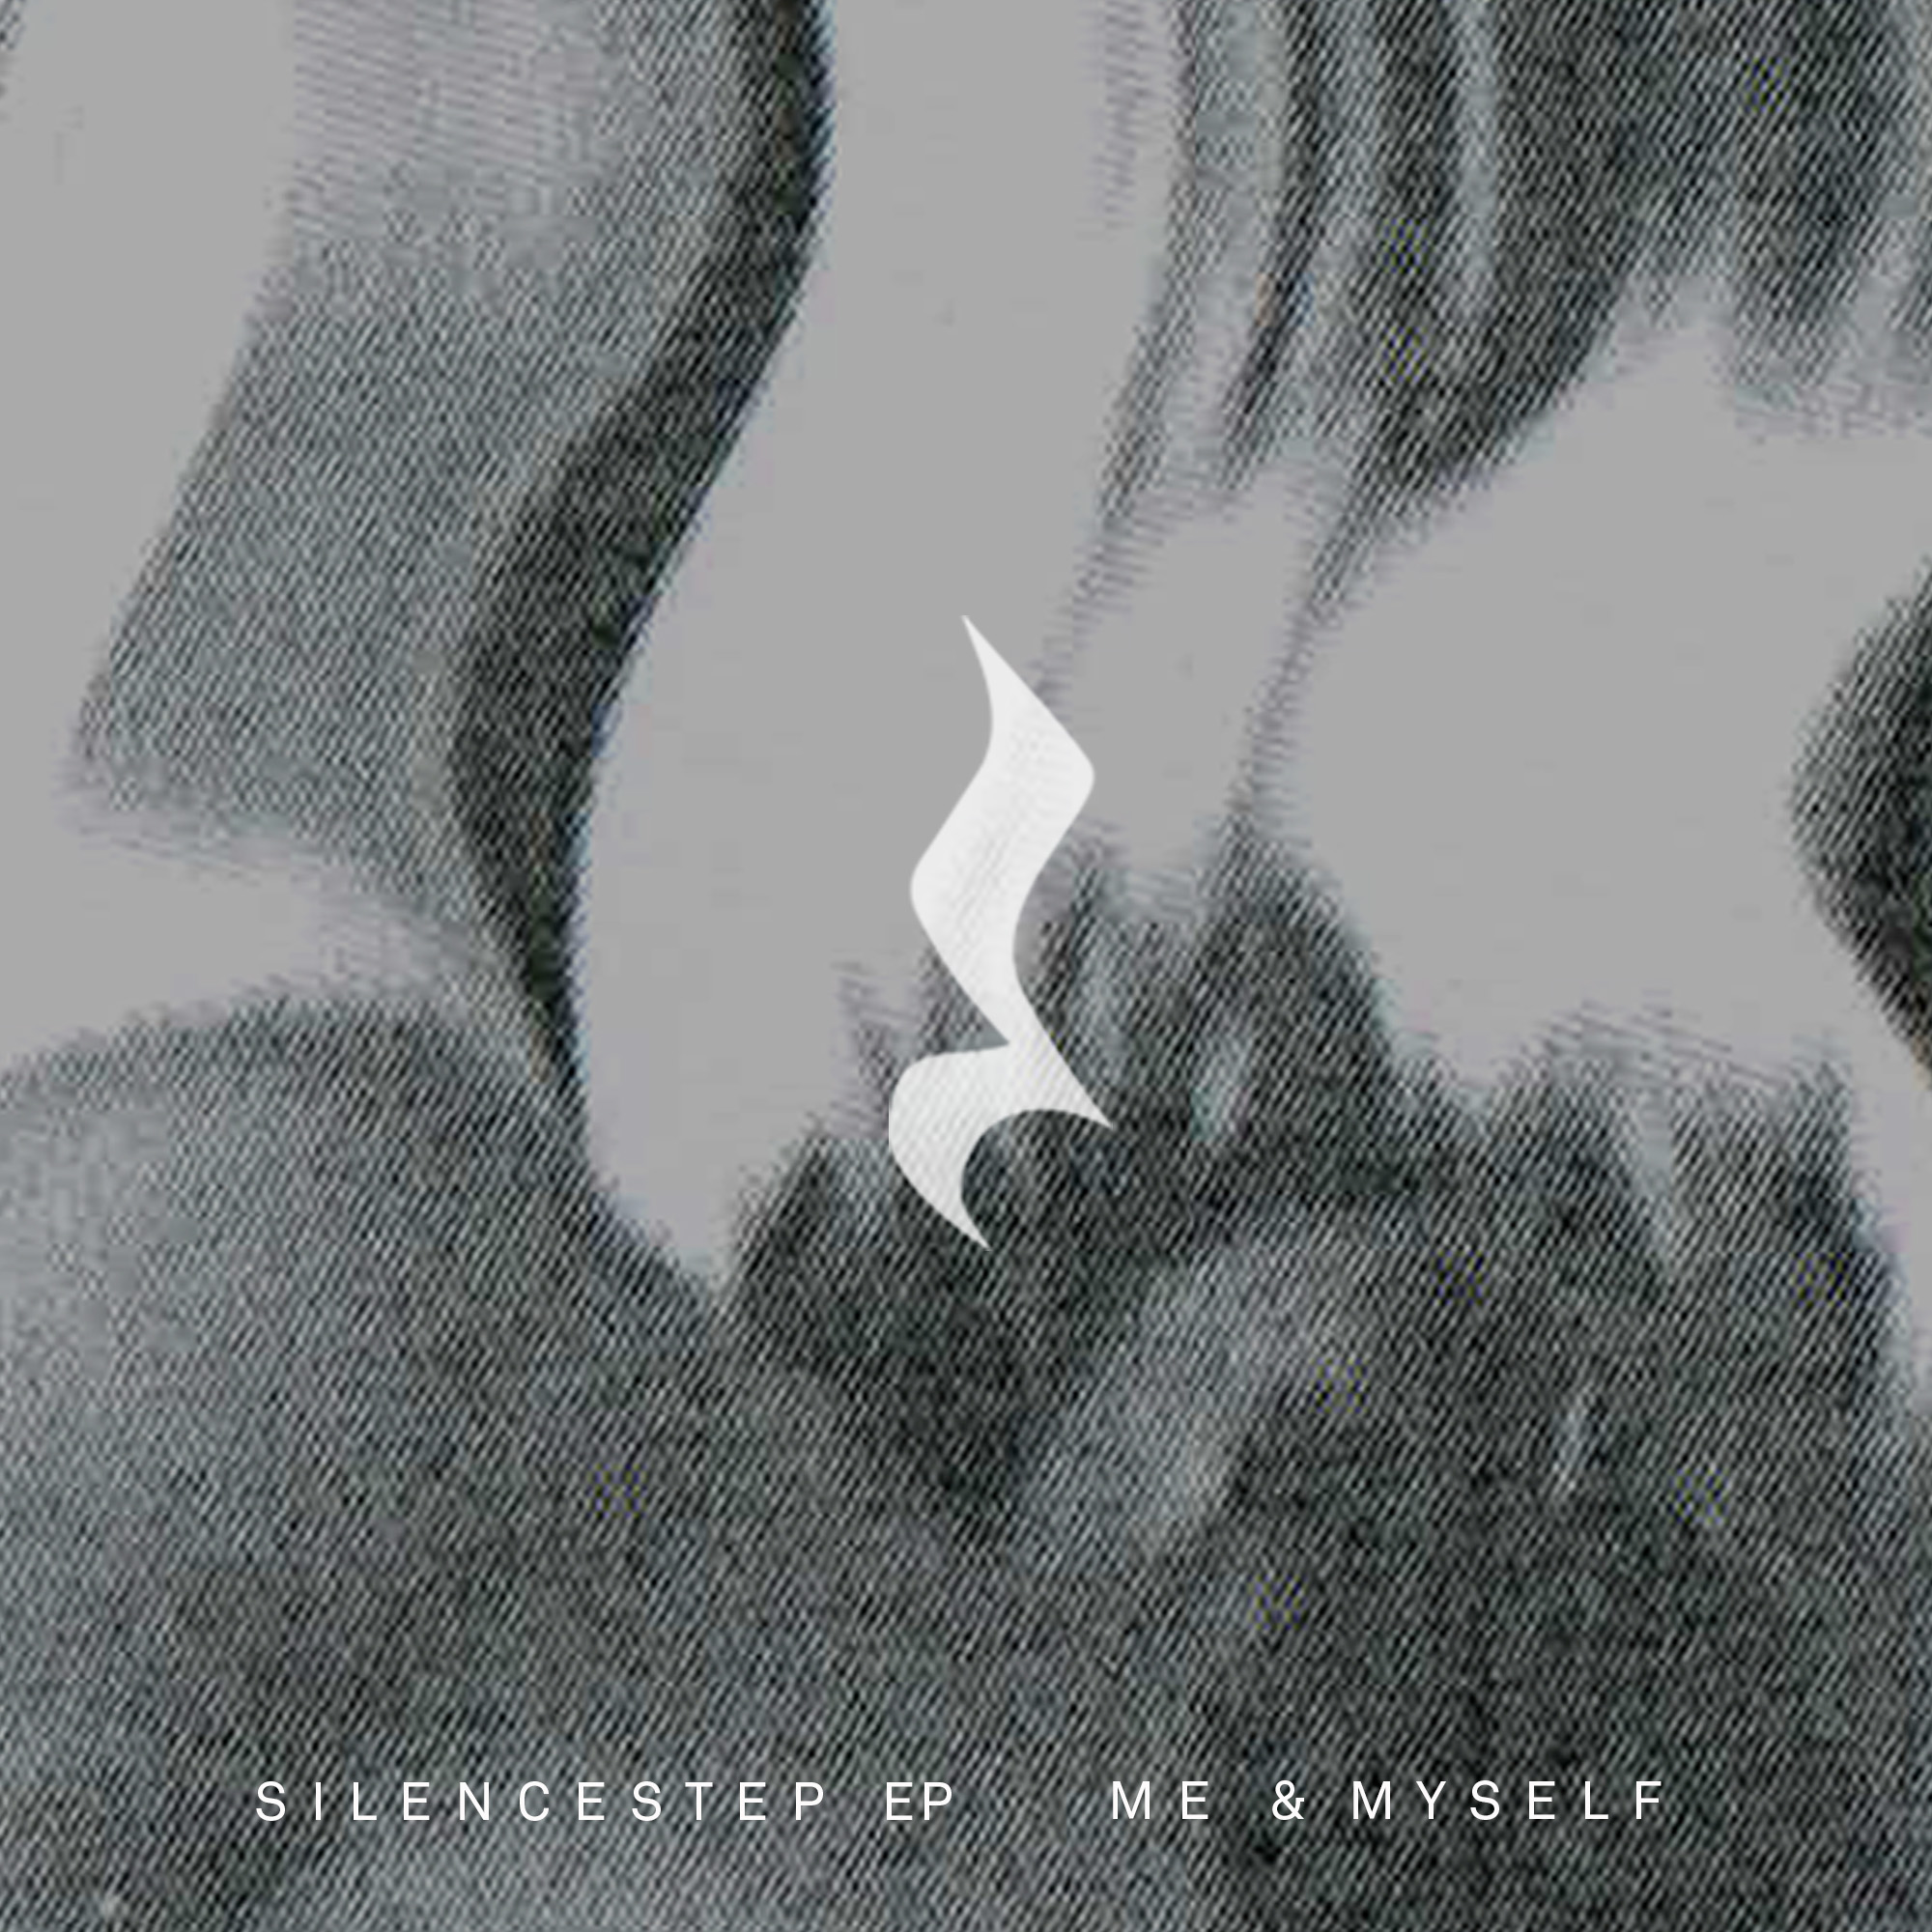 Exclusiva: Me & Myself – Silencestep Part 2 (Invitado Sorpresa Remix)